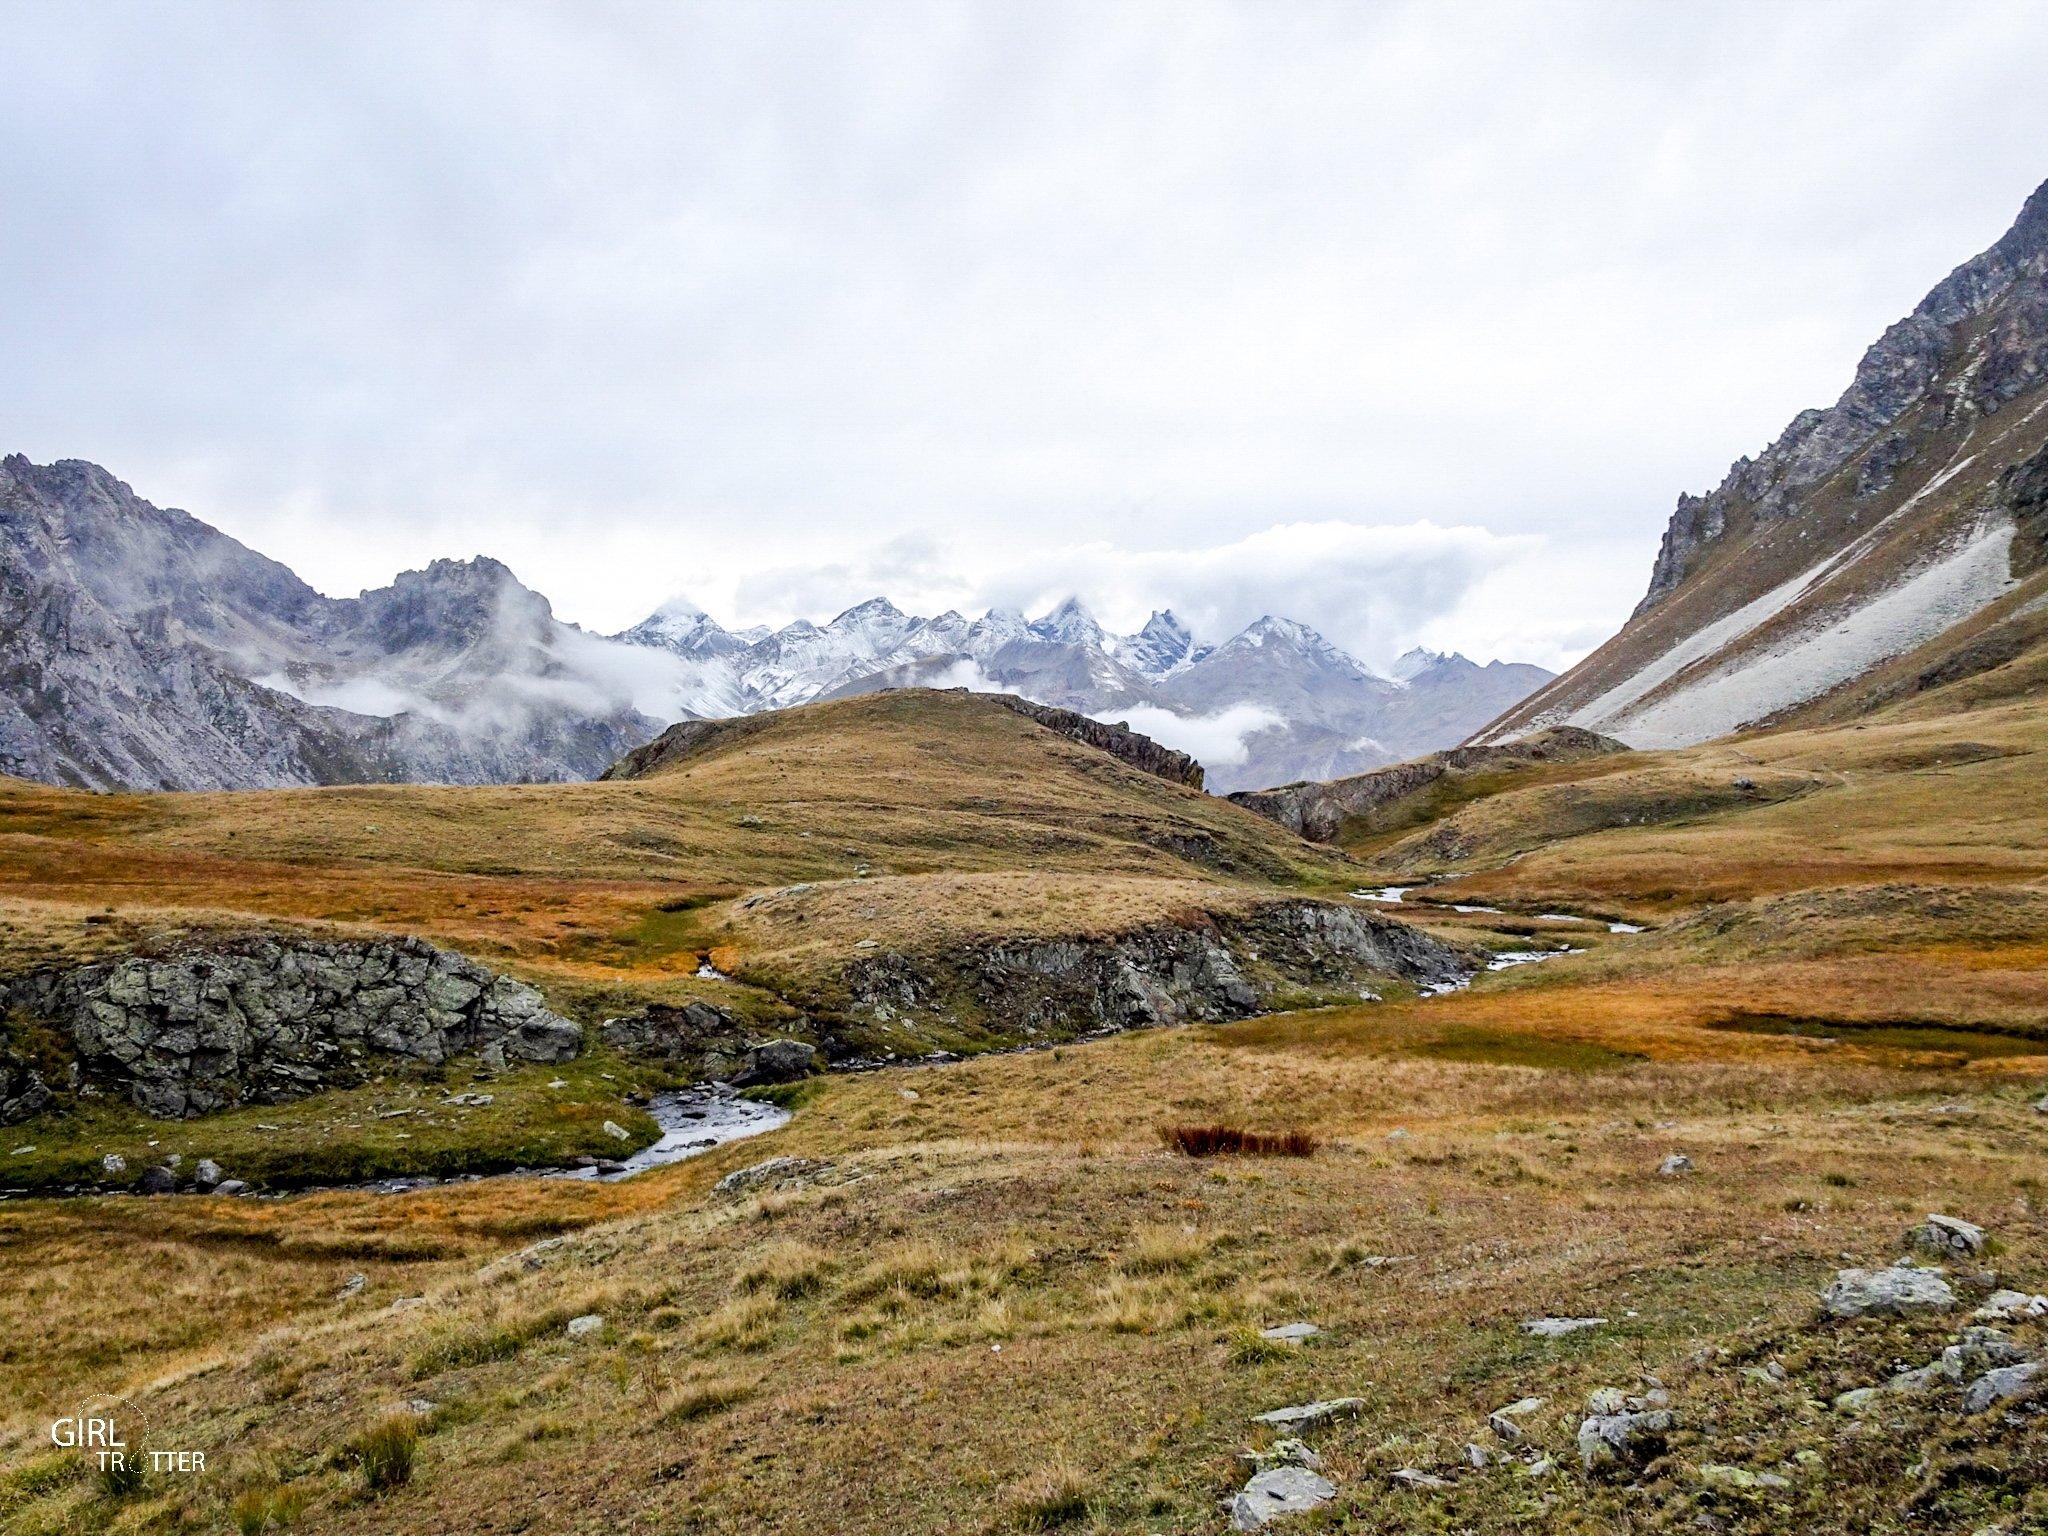 Rando 4 lacs - tour de la fourche - Valloire